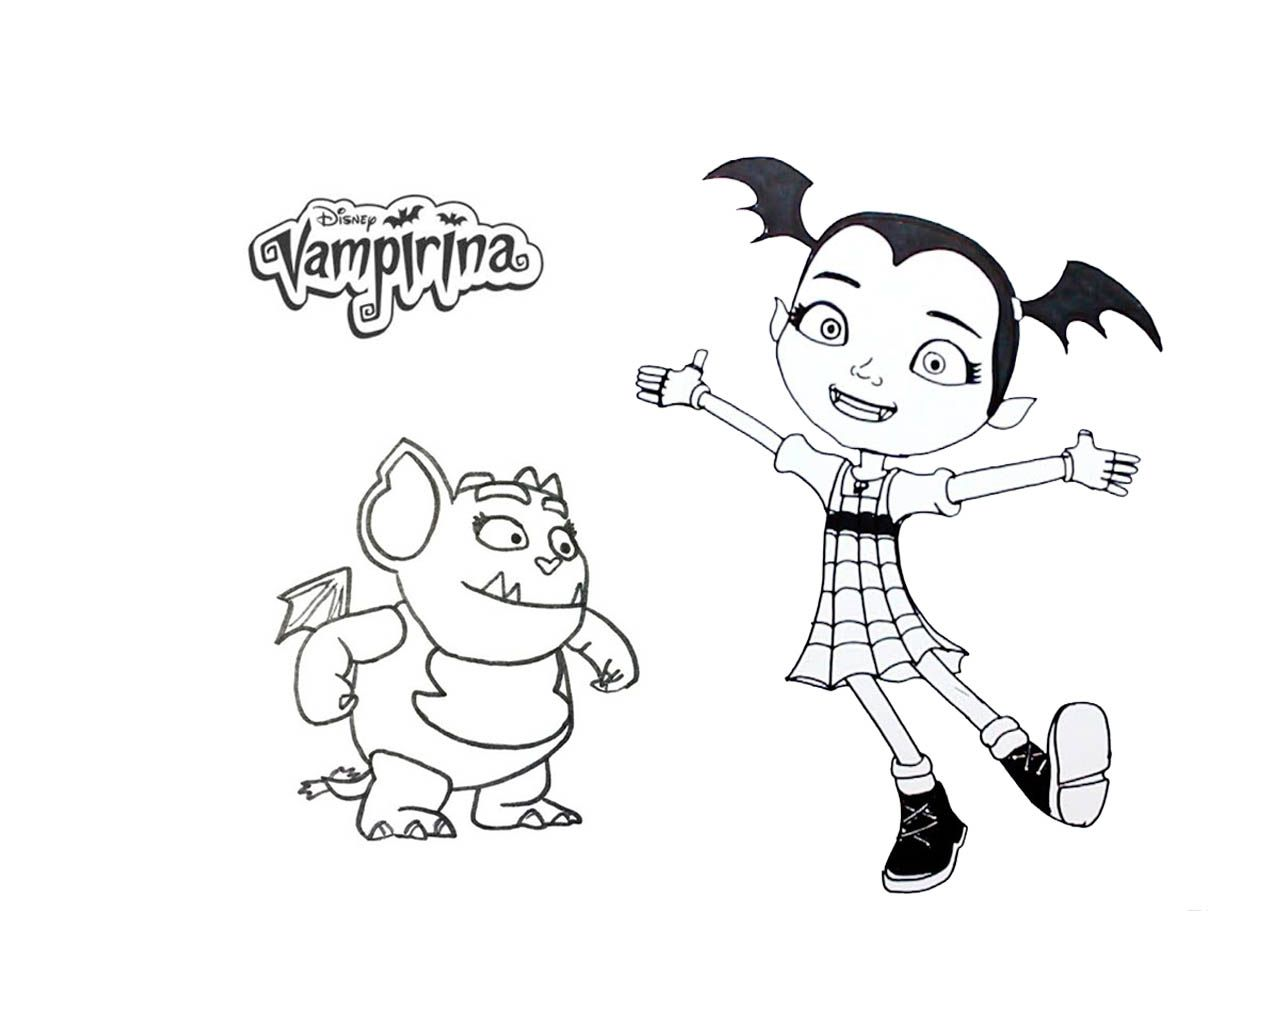 Vampirina Coloring Page 09 Jpg 1 280 1 024 Pixels Dibujos De